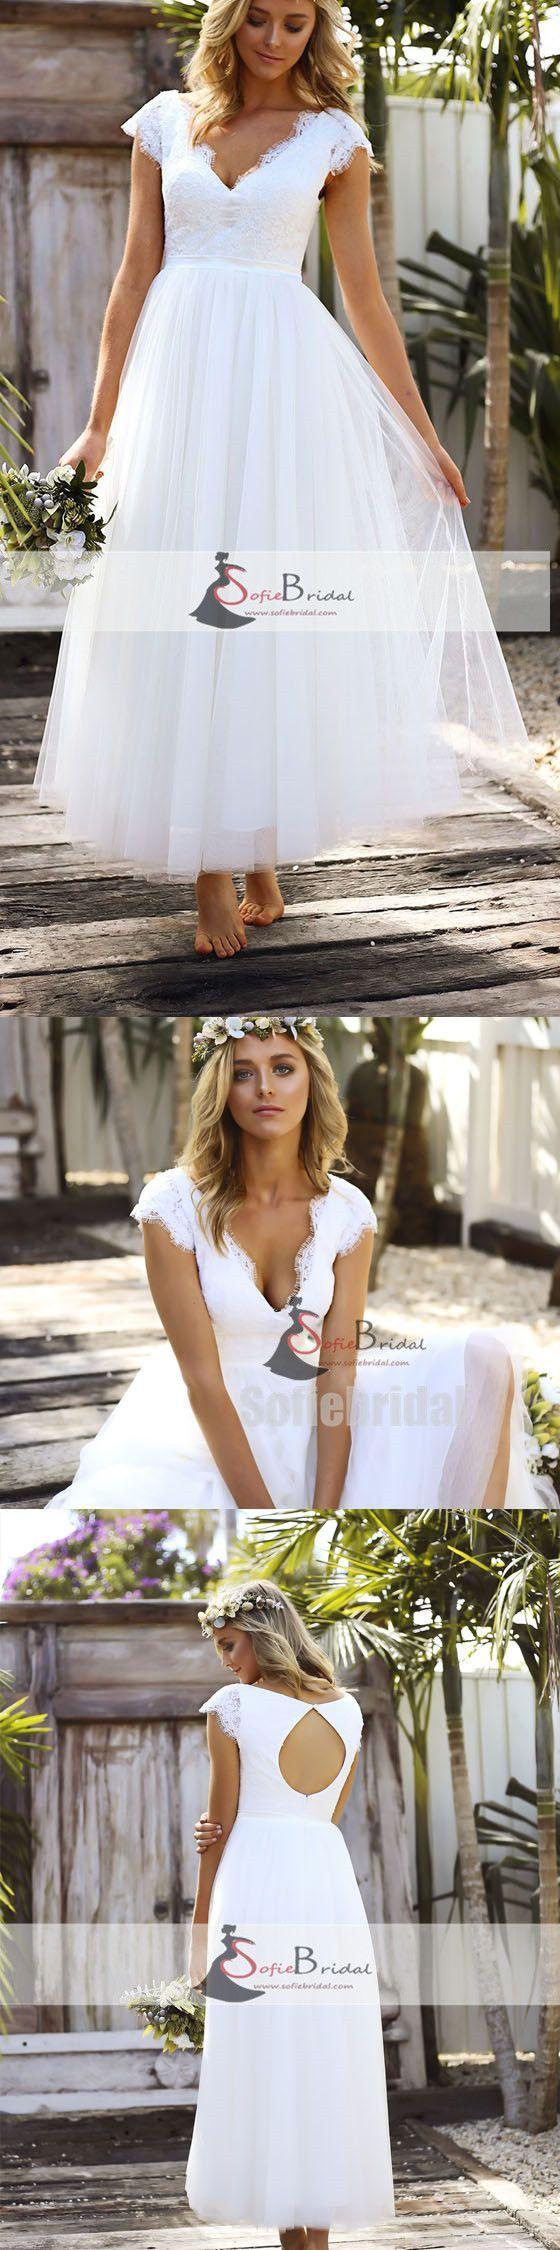 Cap sleeve vneck long aline lace tulle wedding dresses open back